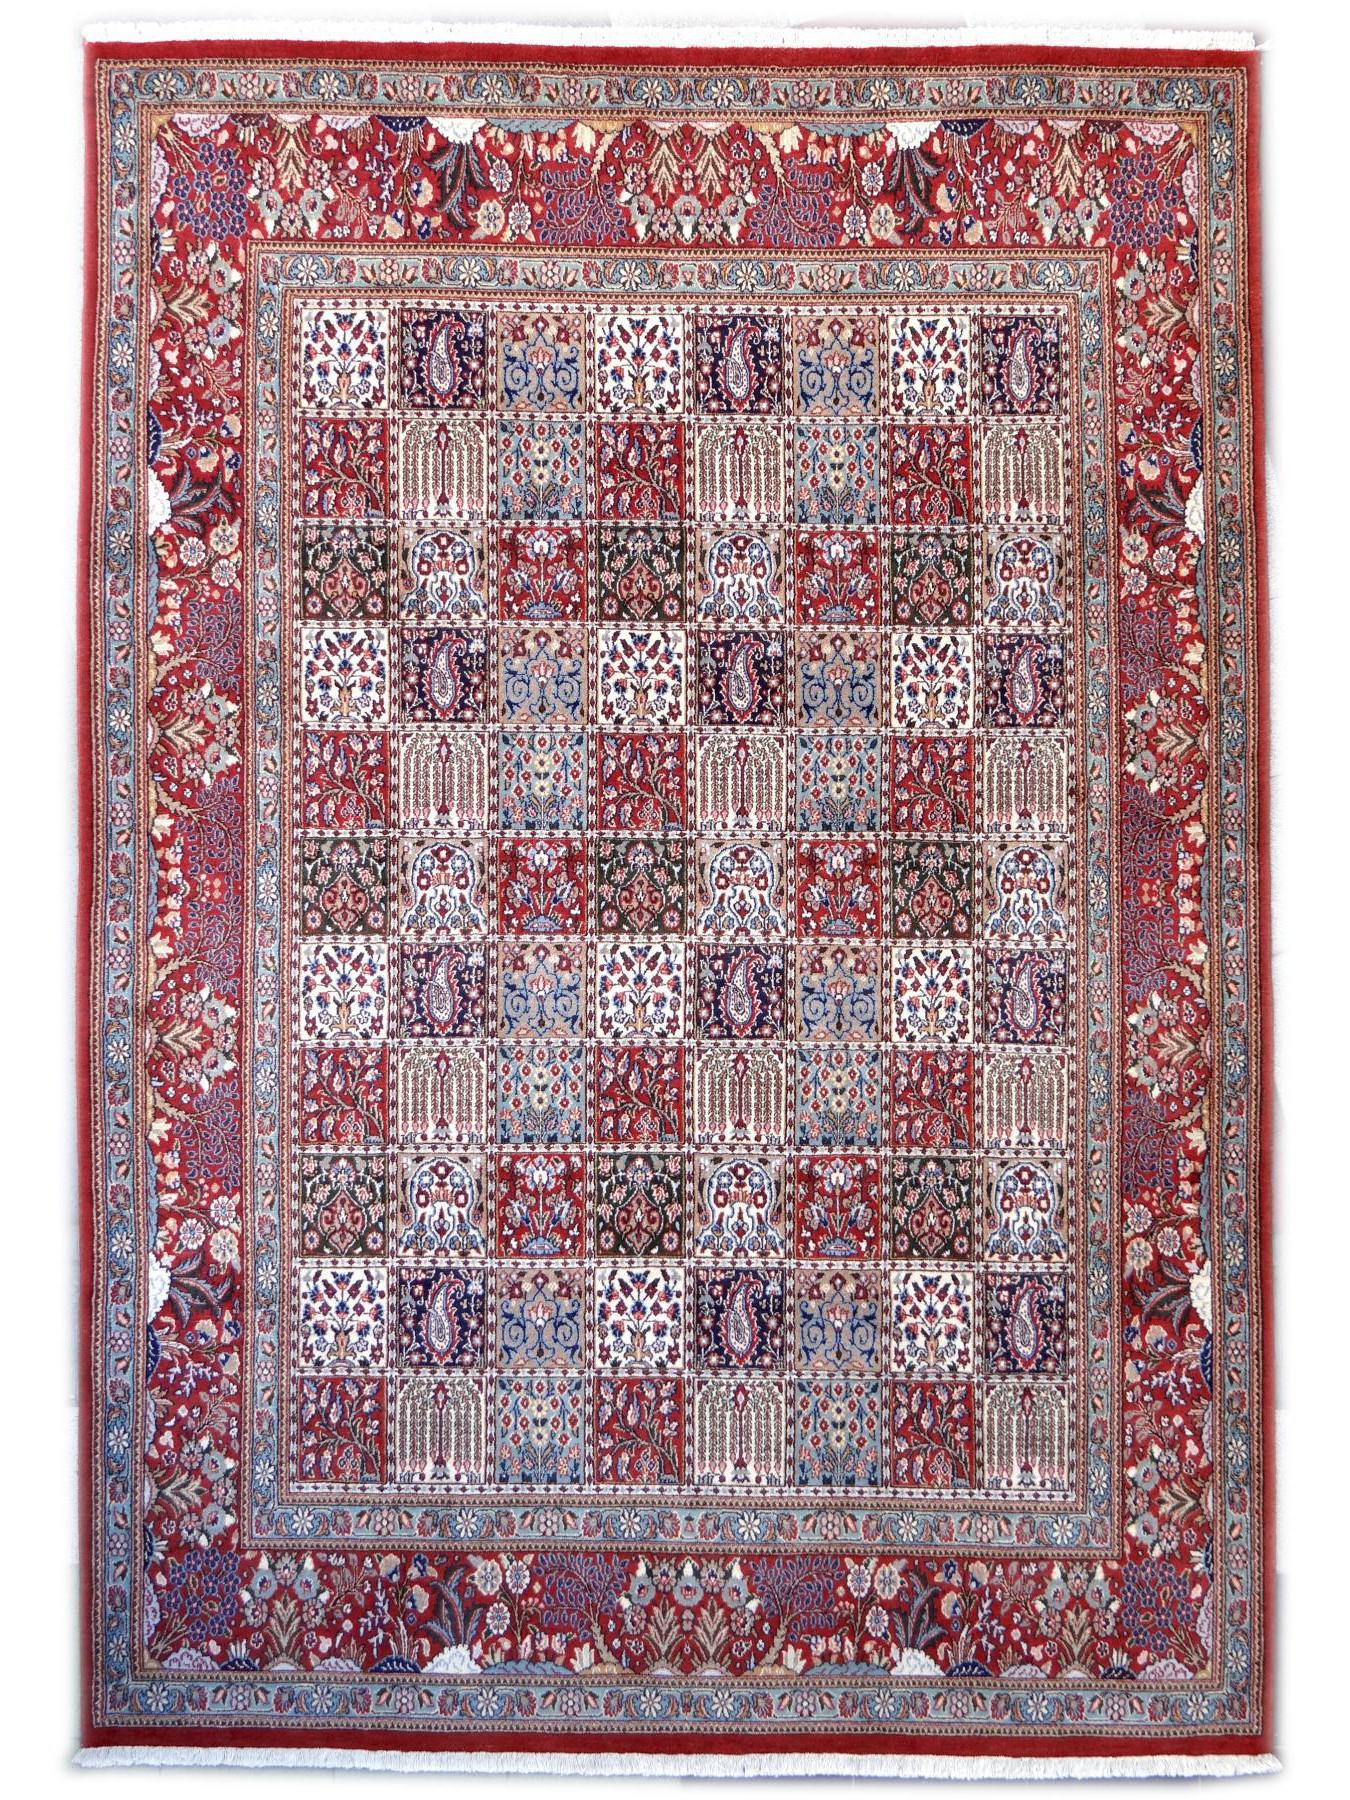 Moud Garden Persian Carpets N 2487 301x213cm